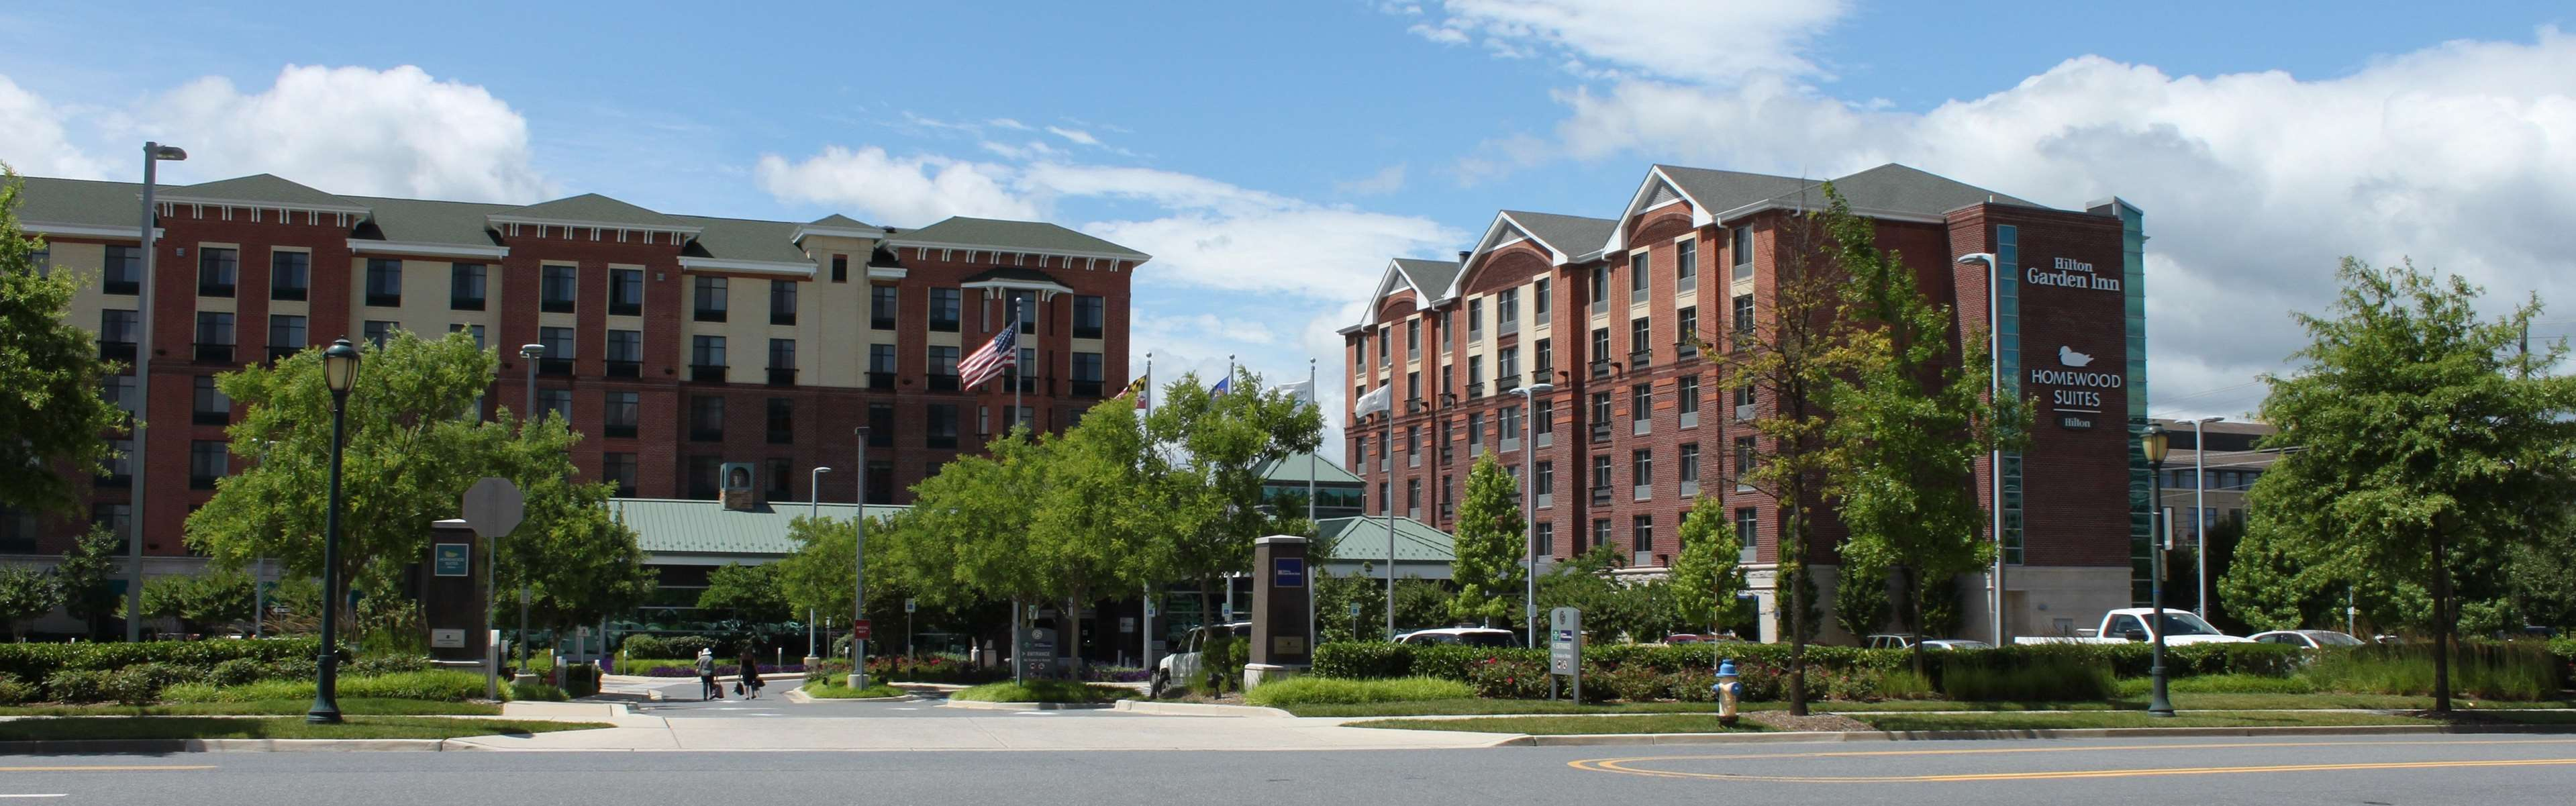 Hilton Garden Inn Rockville-Gaithersburg image 20